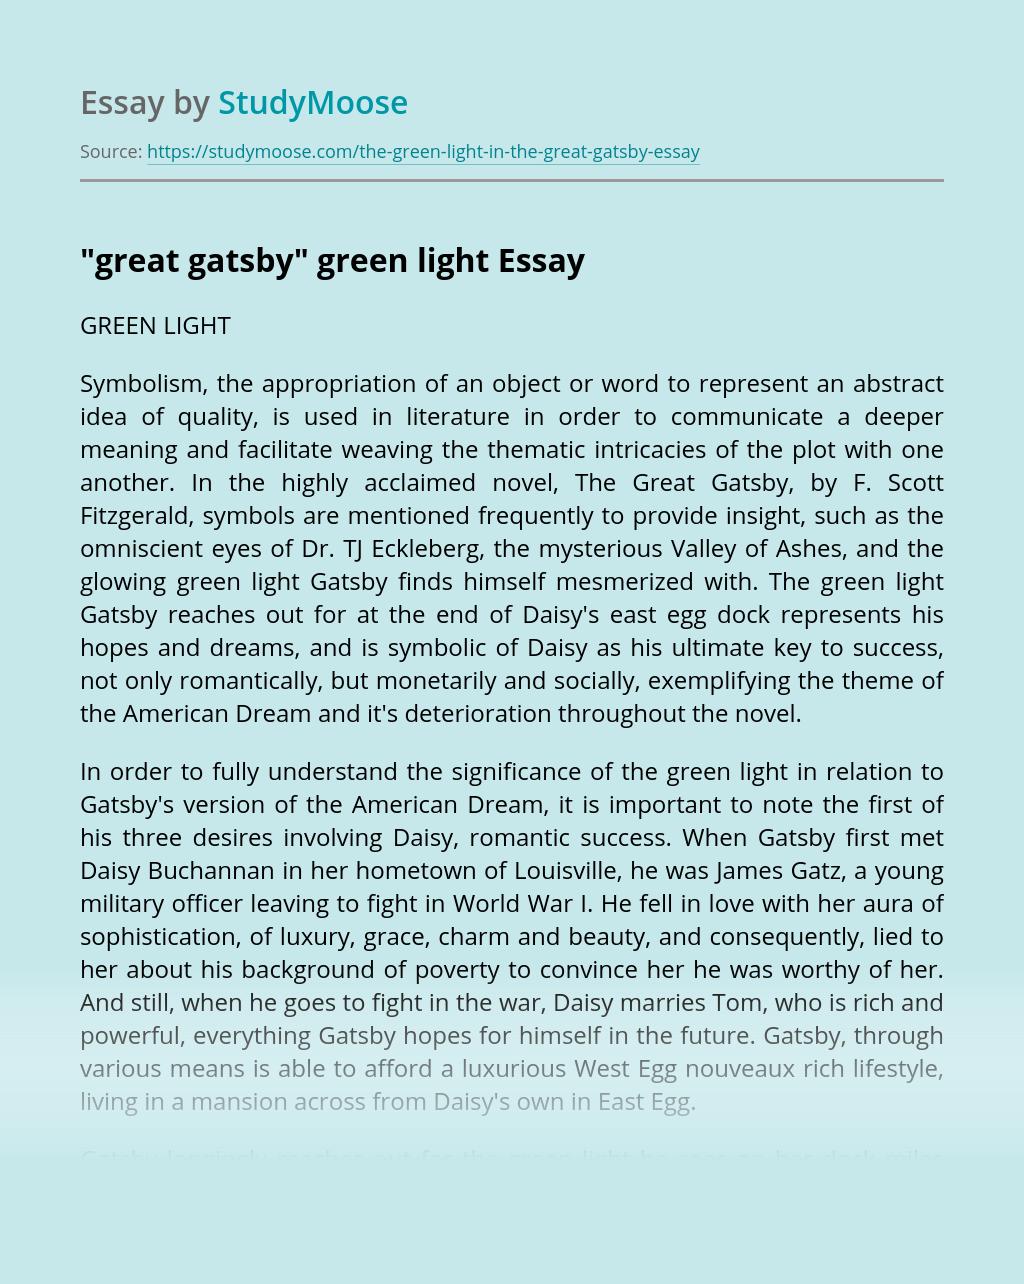 """great gatsby"" green light"